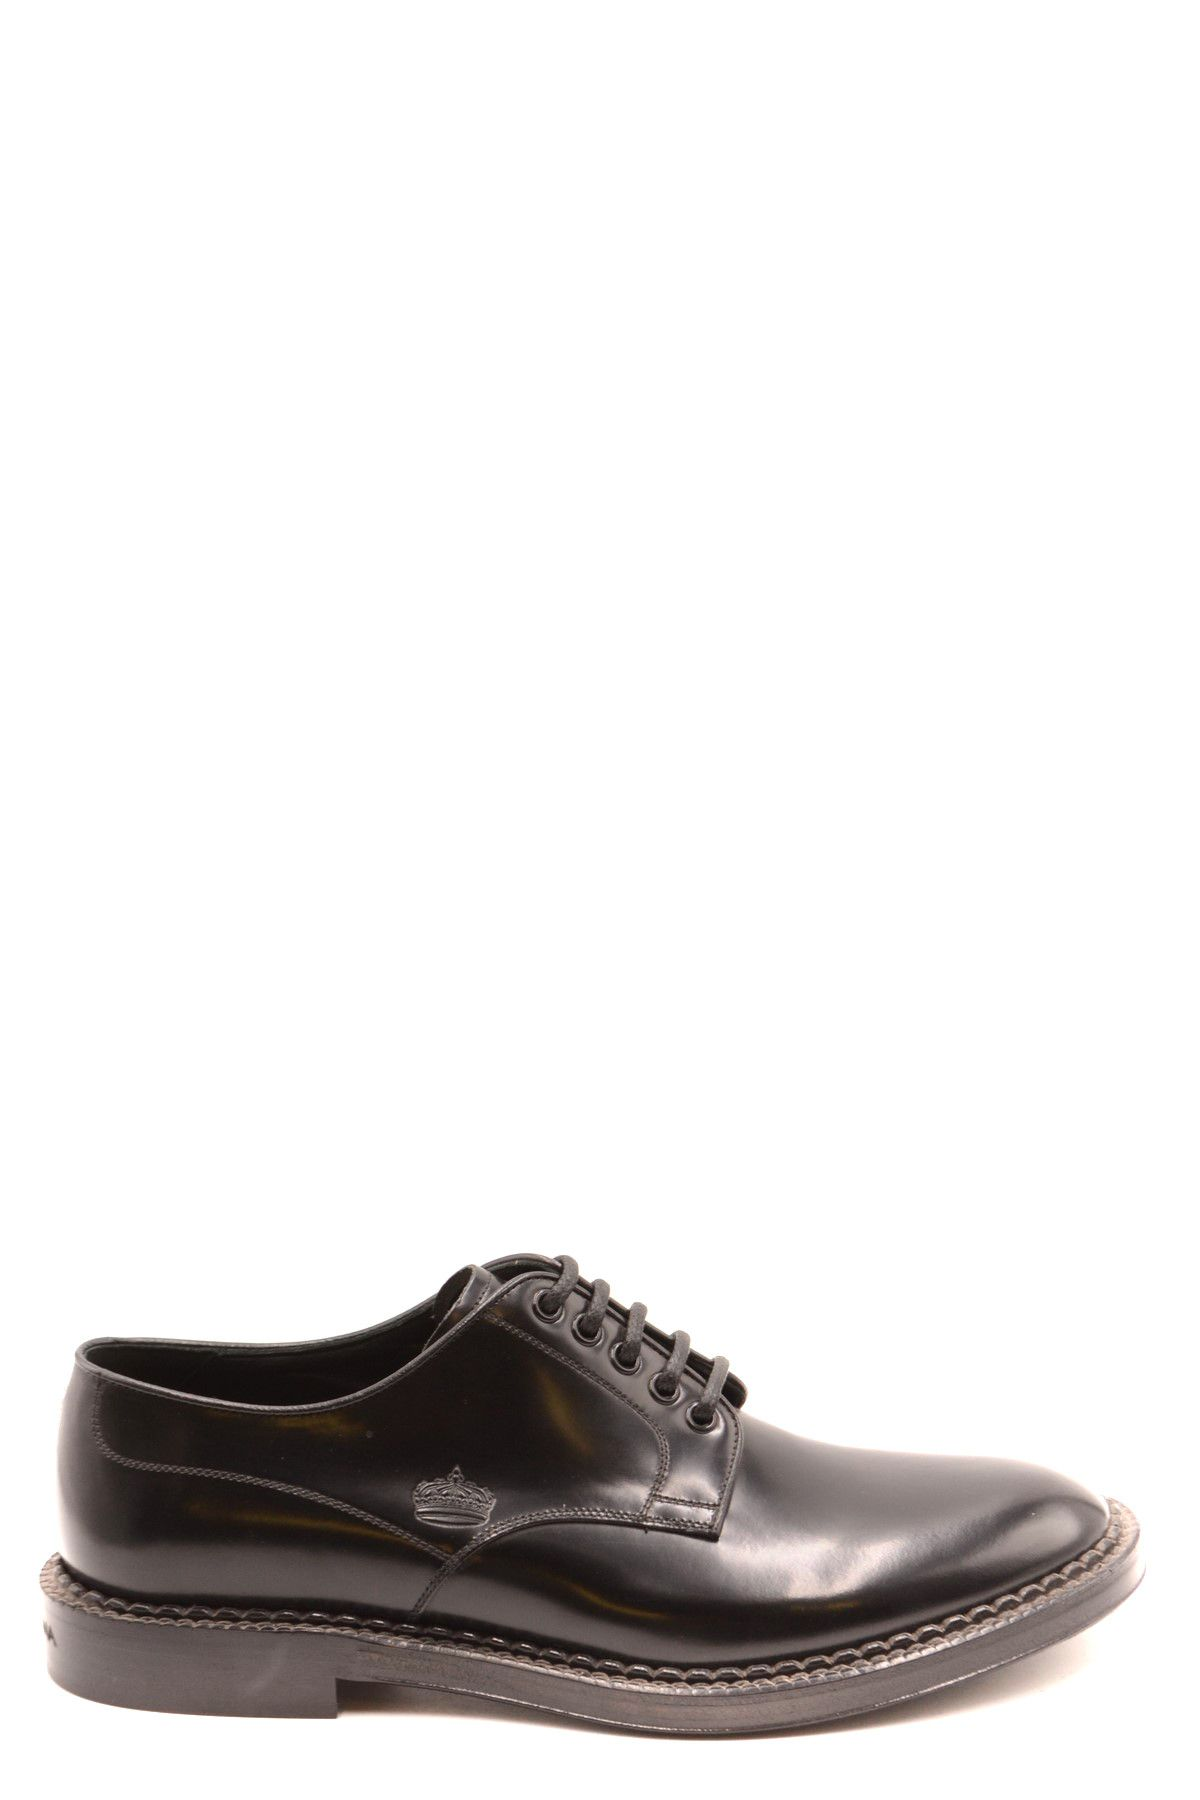 Dolce & Gabbana Men's Lace Ups Shoes In Black